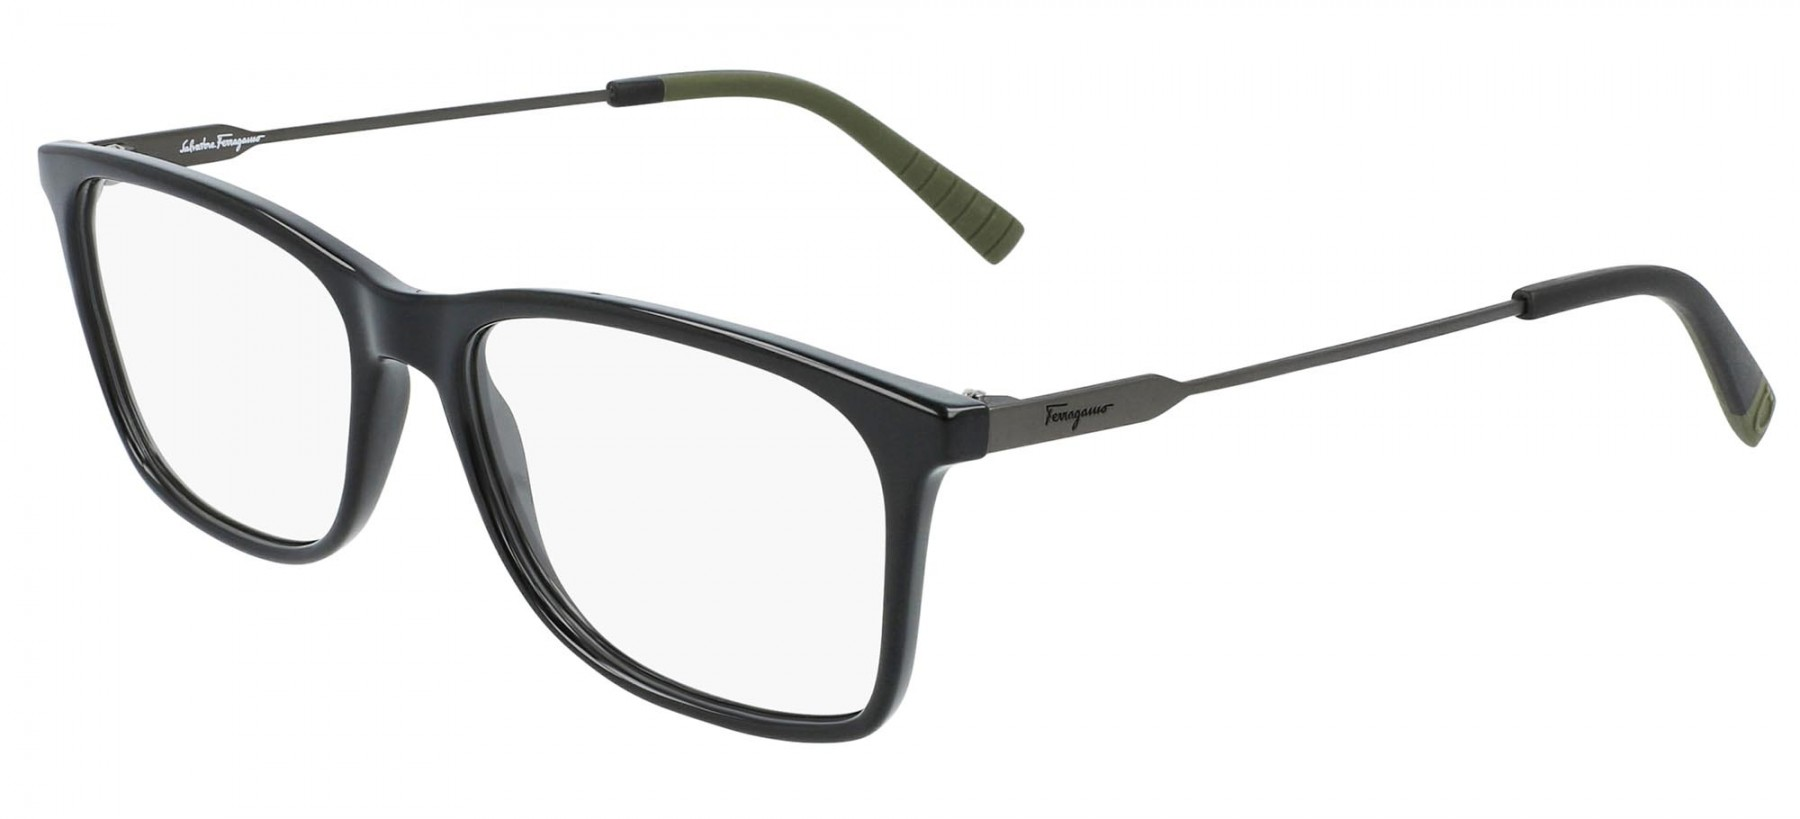 Salvatore Ferragamo 2876 021 - Oculos de Grau